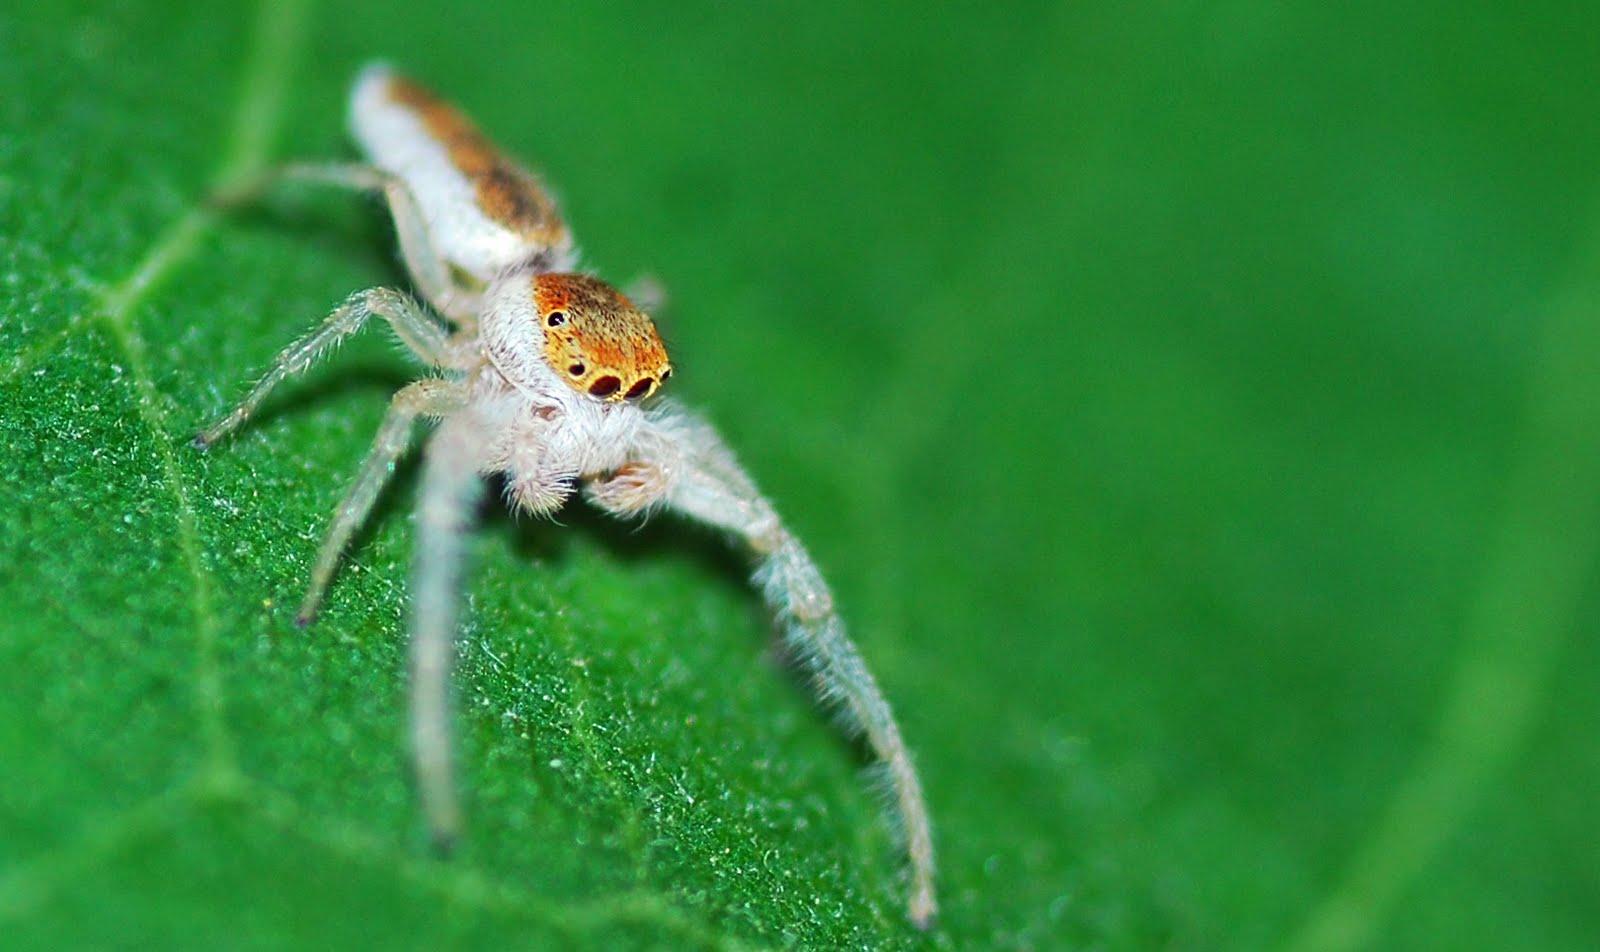 Jumping spider bite